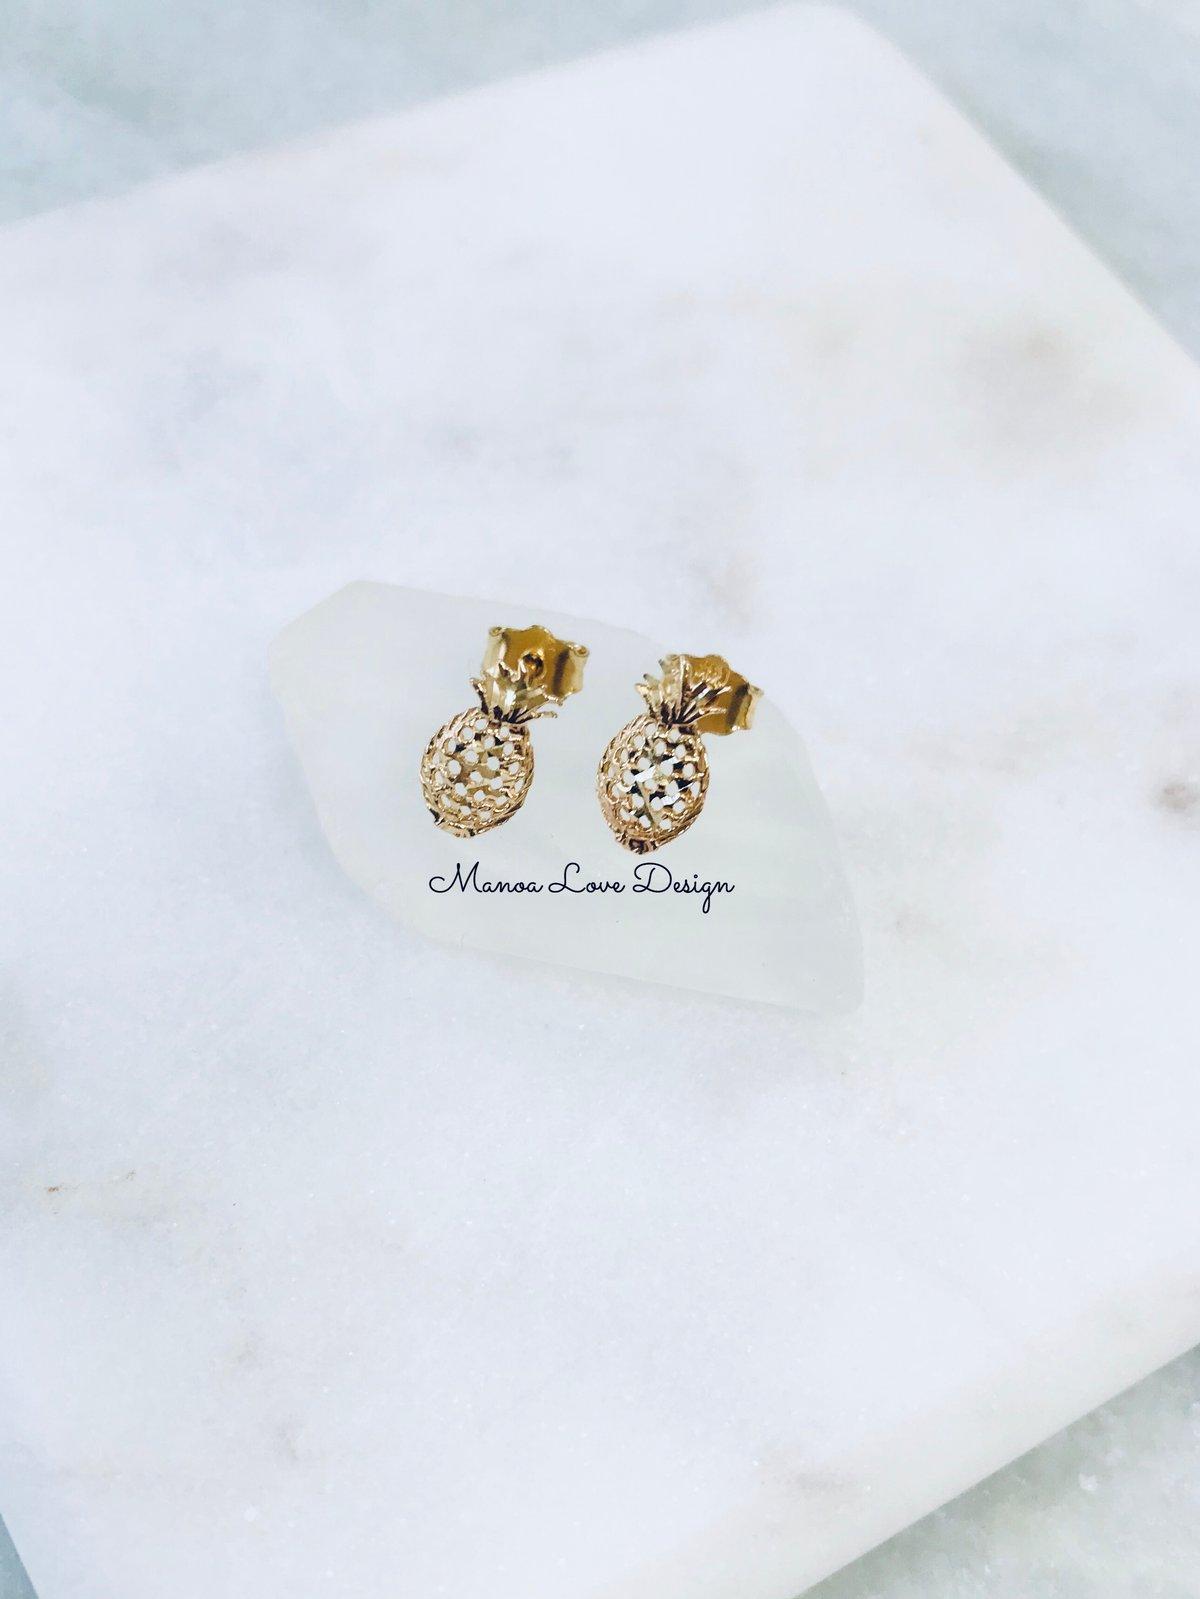 Image of Palm tree earrings, pineapple earrings